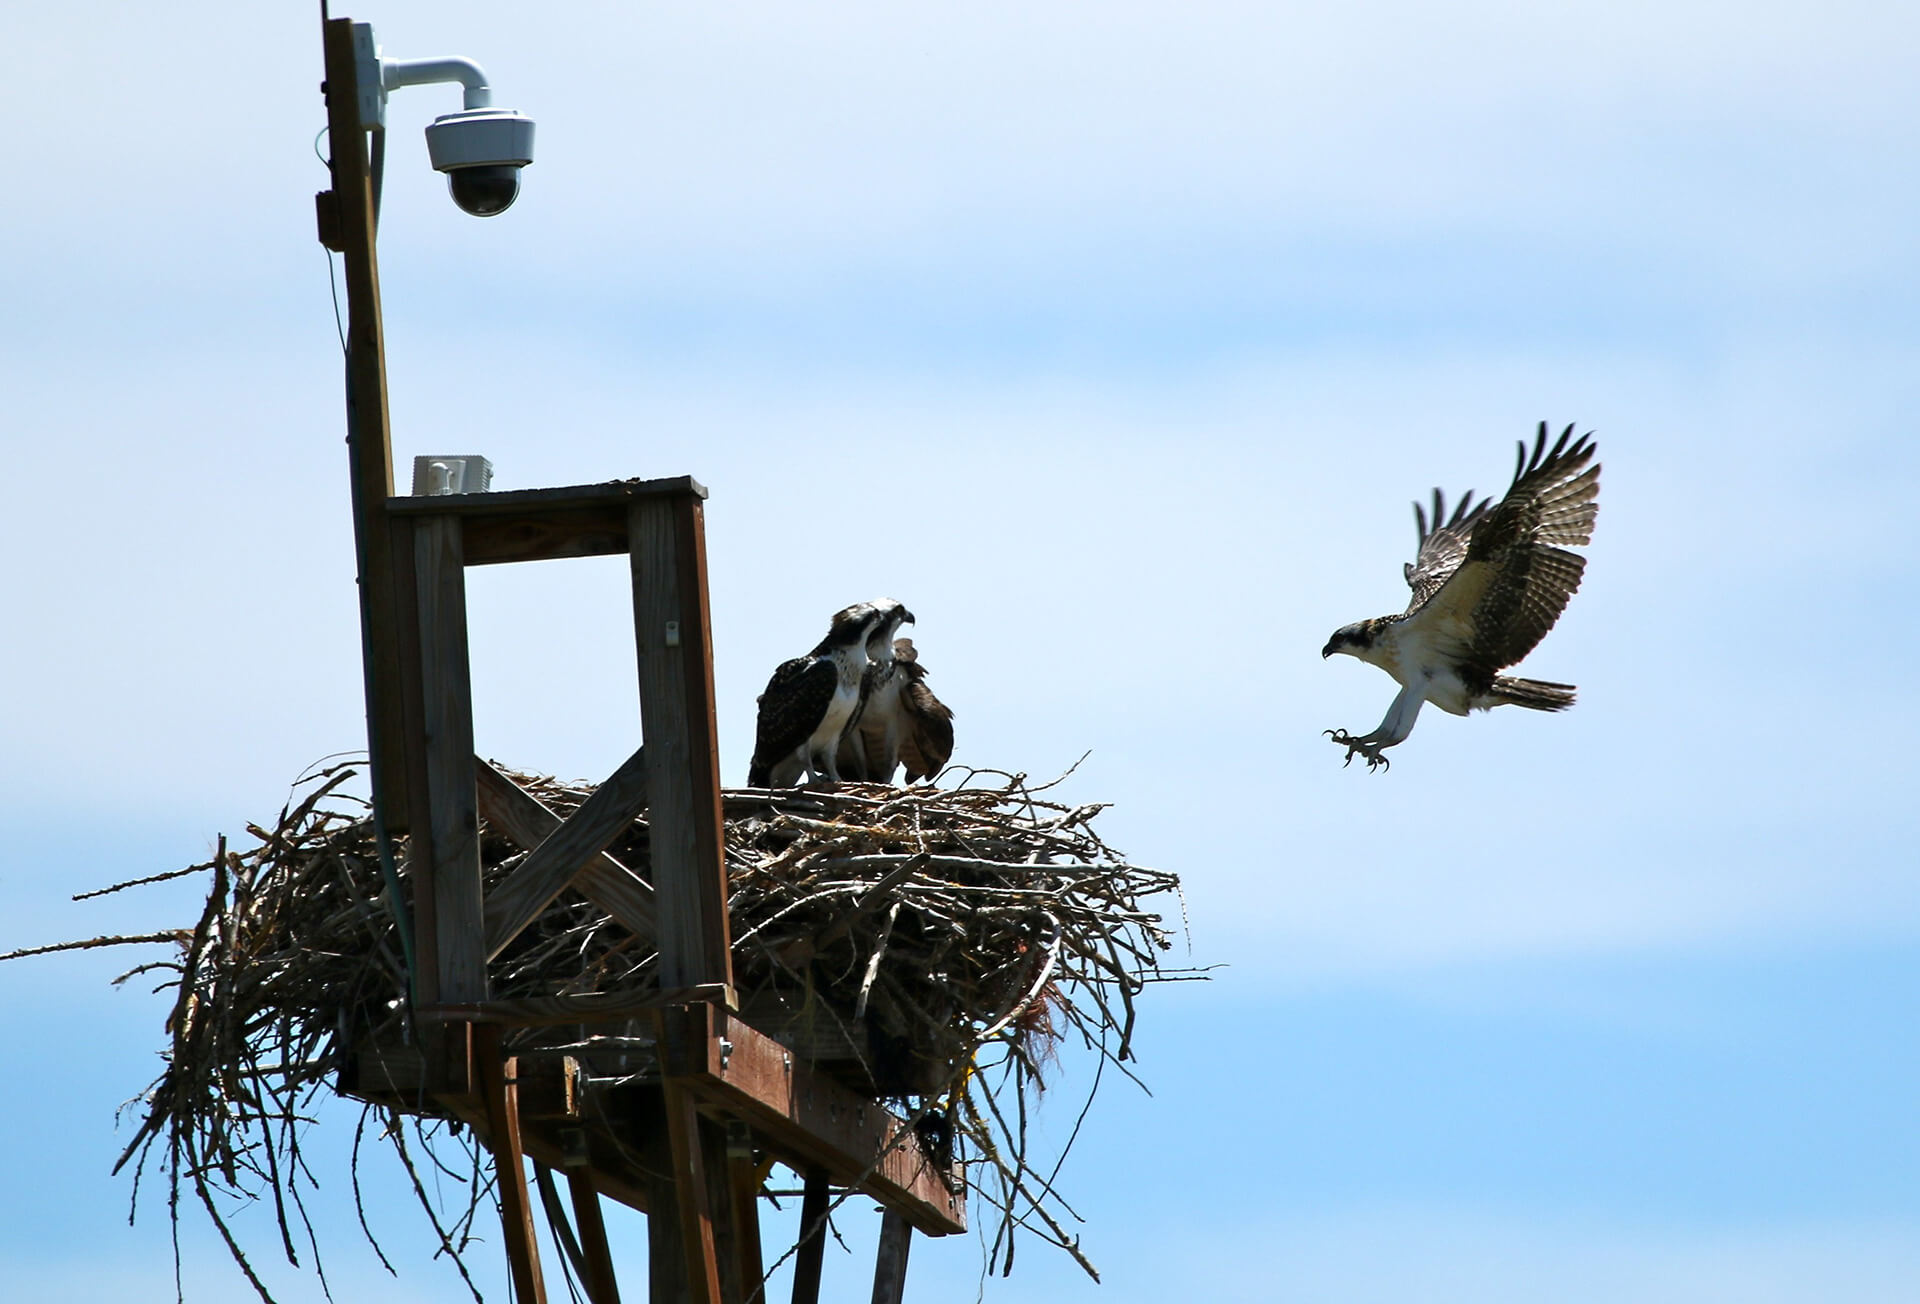 Enlightened urban ospreys nest on lampposts